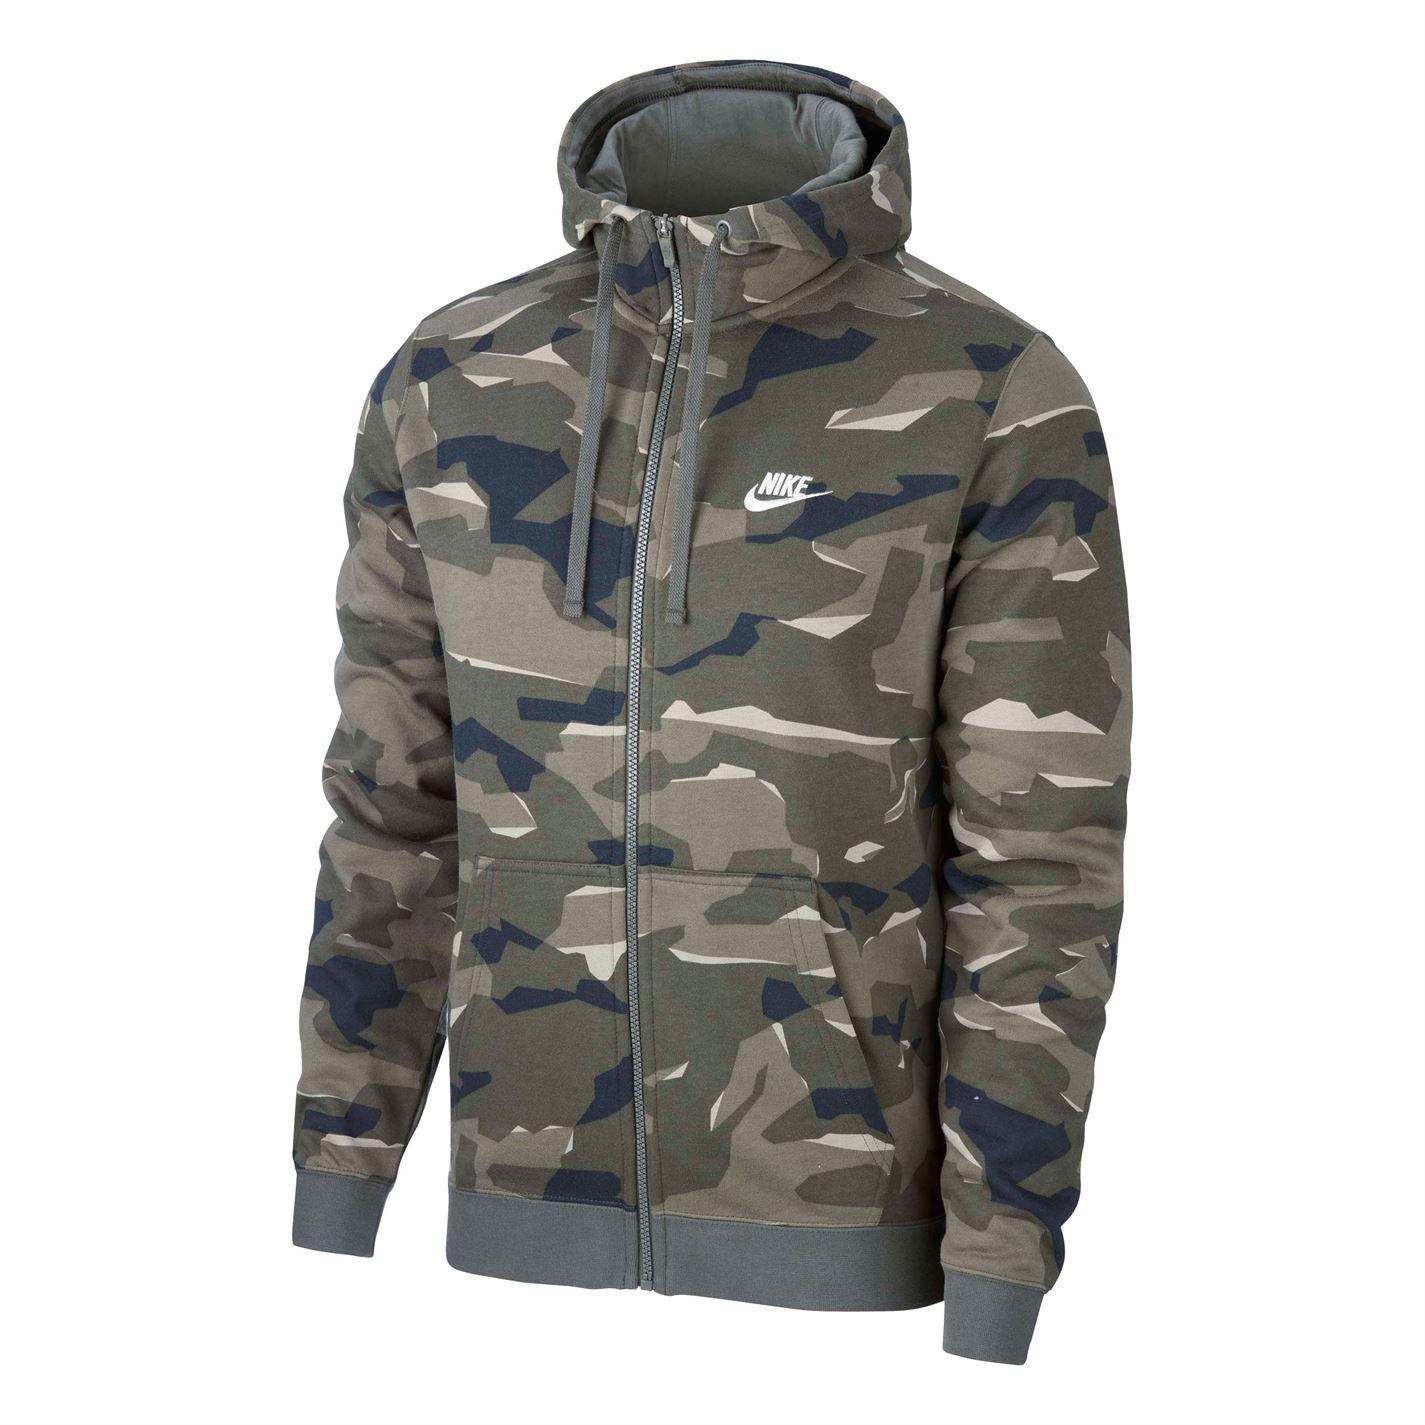 6a4d6617c4f7 ... Nike Camouflage Full Zip Hoody veste Mens Hoodie sweat-shirt chandail à  capuchon Top